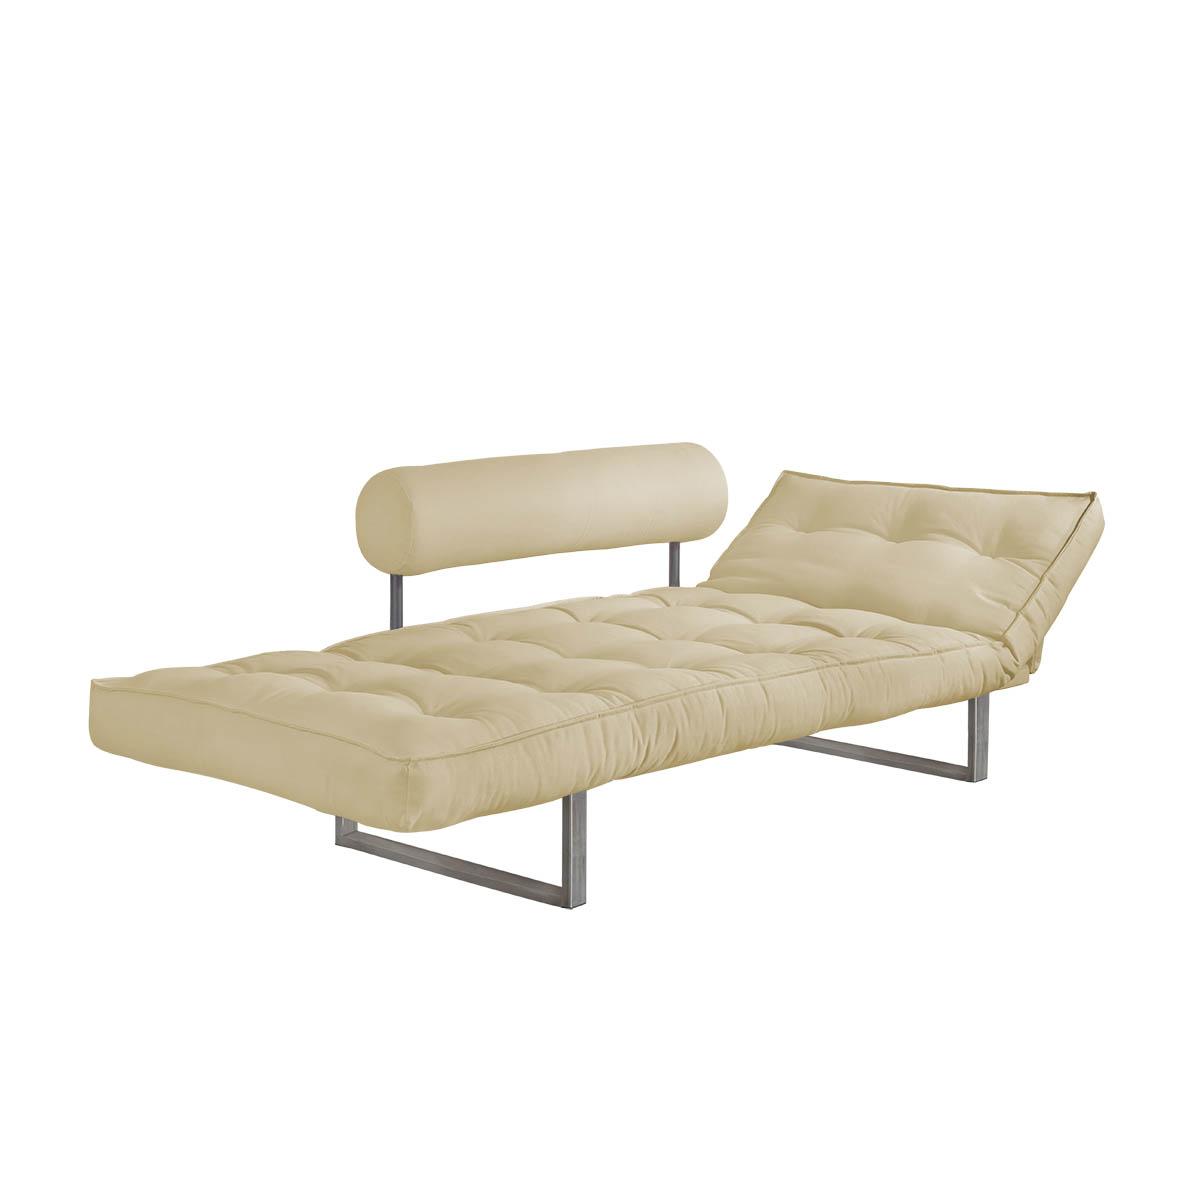 Sofa cama solteiro futon company for Sofa cama monoplaza